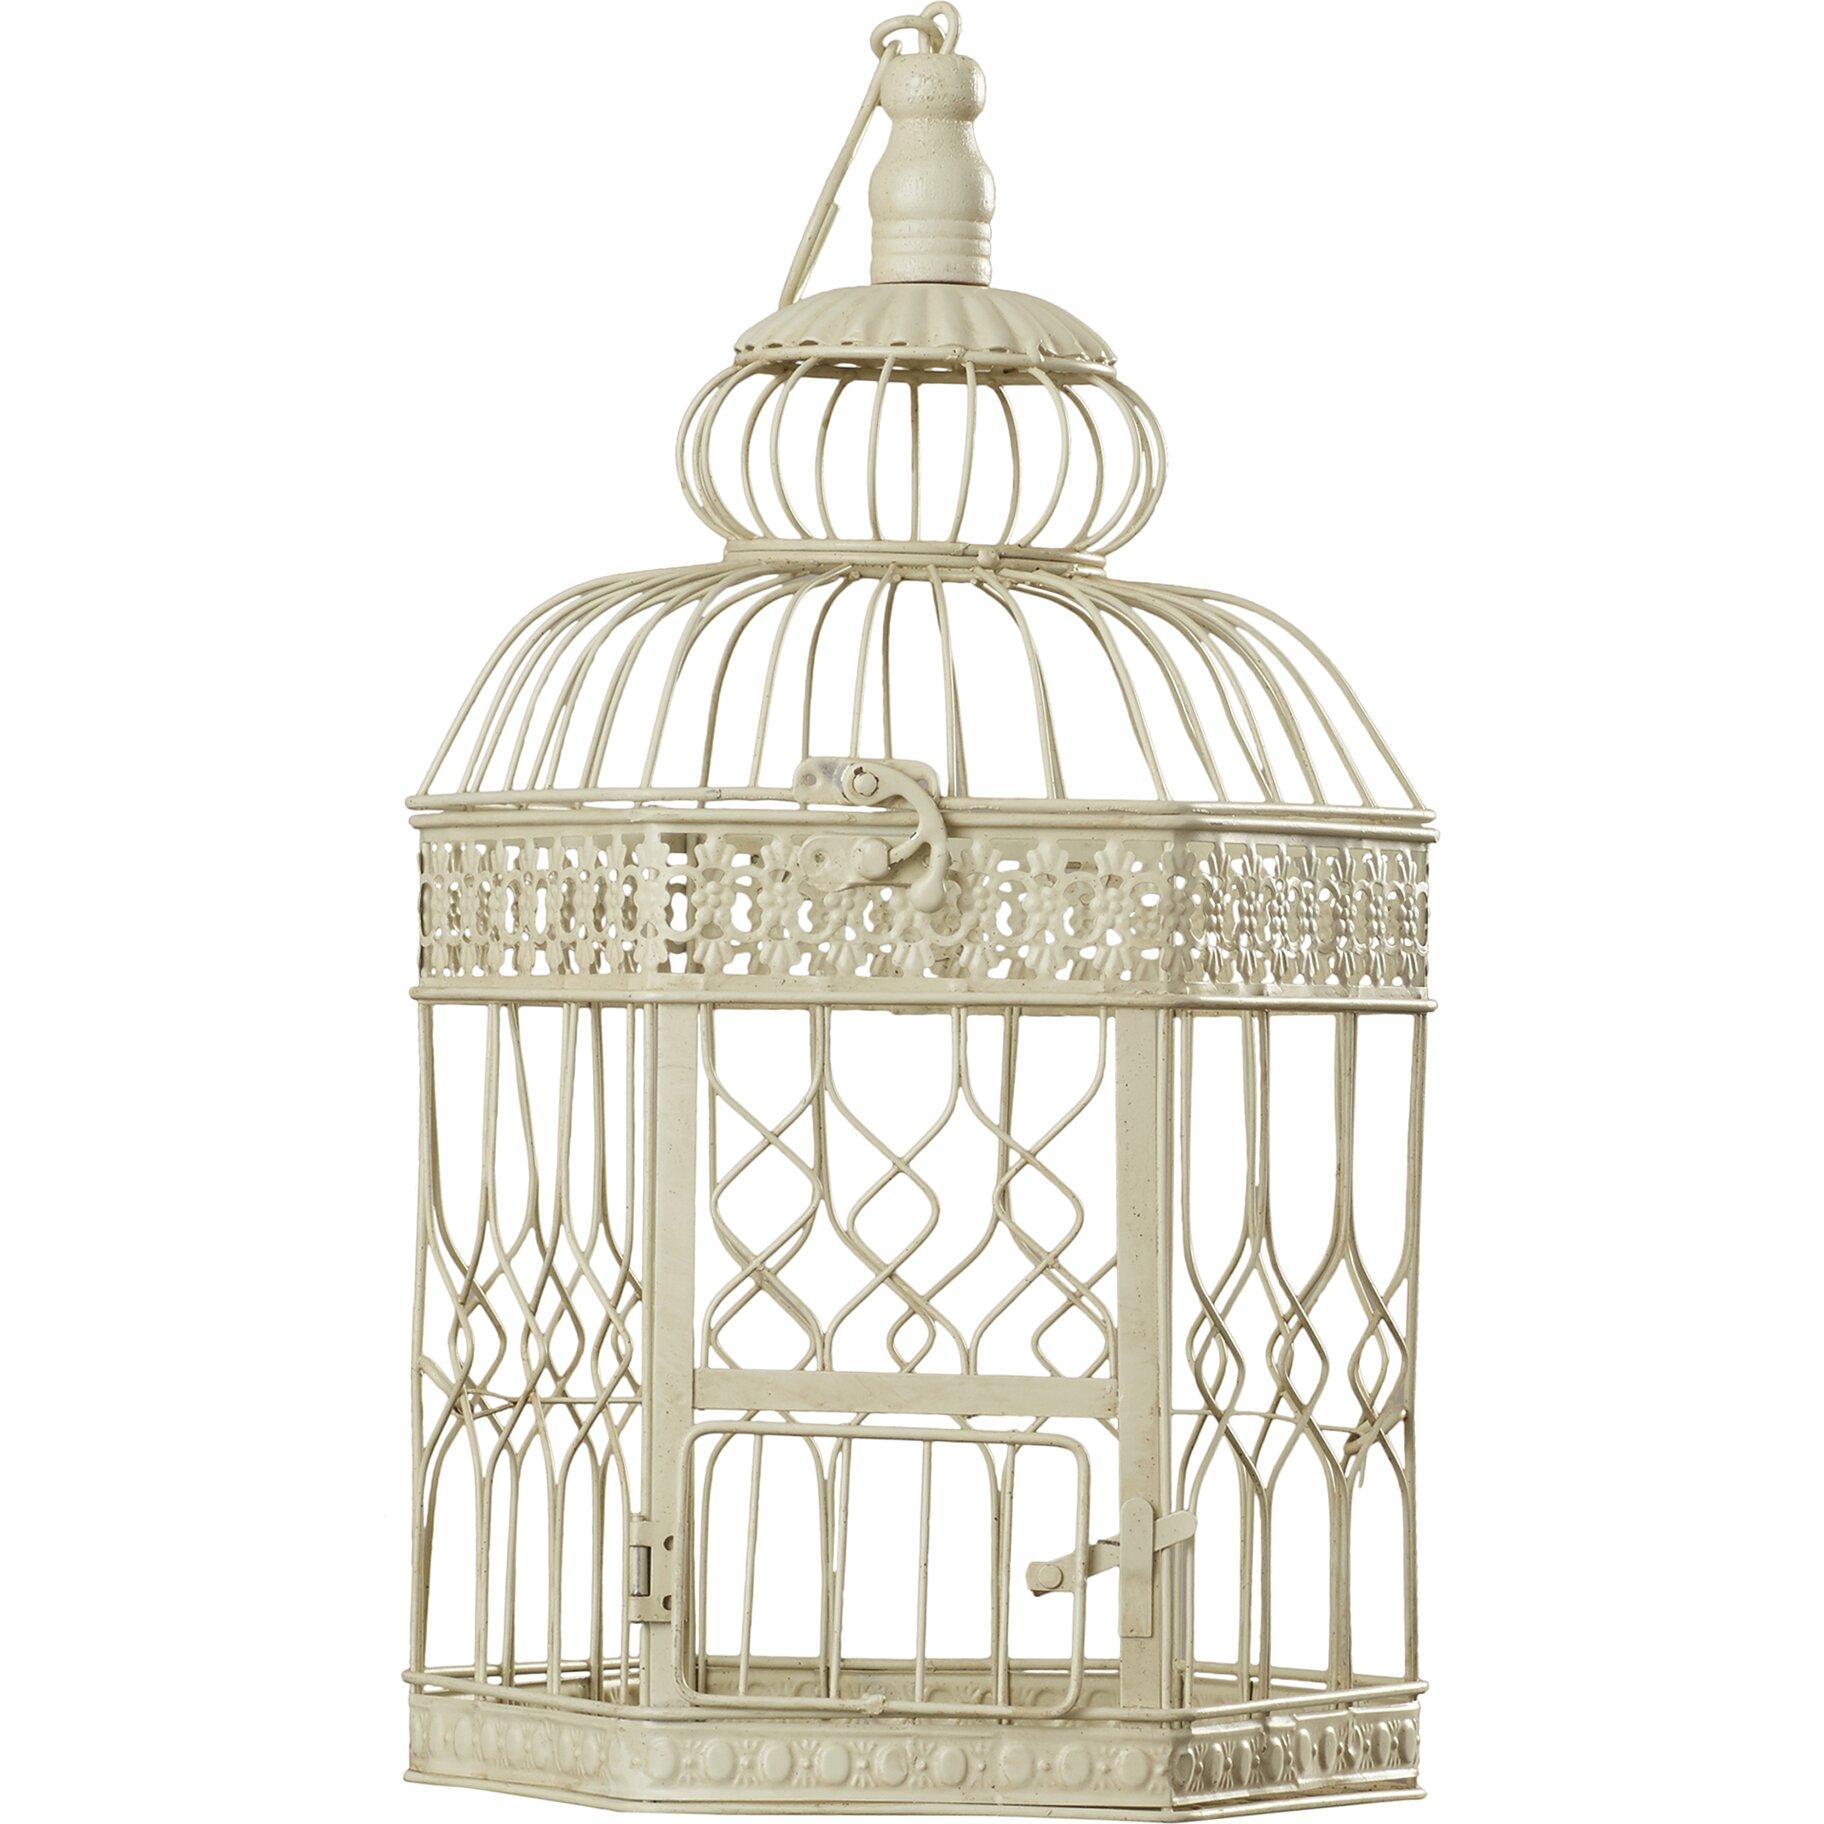 darby home co 2 piece decorative metal bird cage set vintage pair brass quail interior home decorative pieces